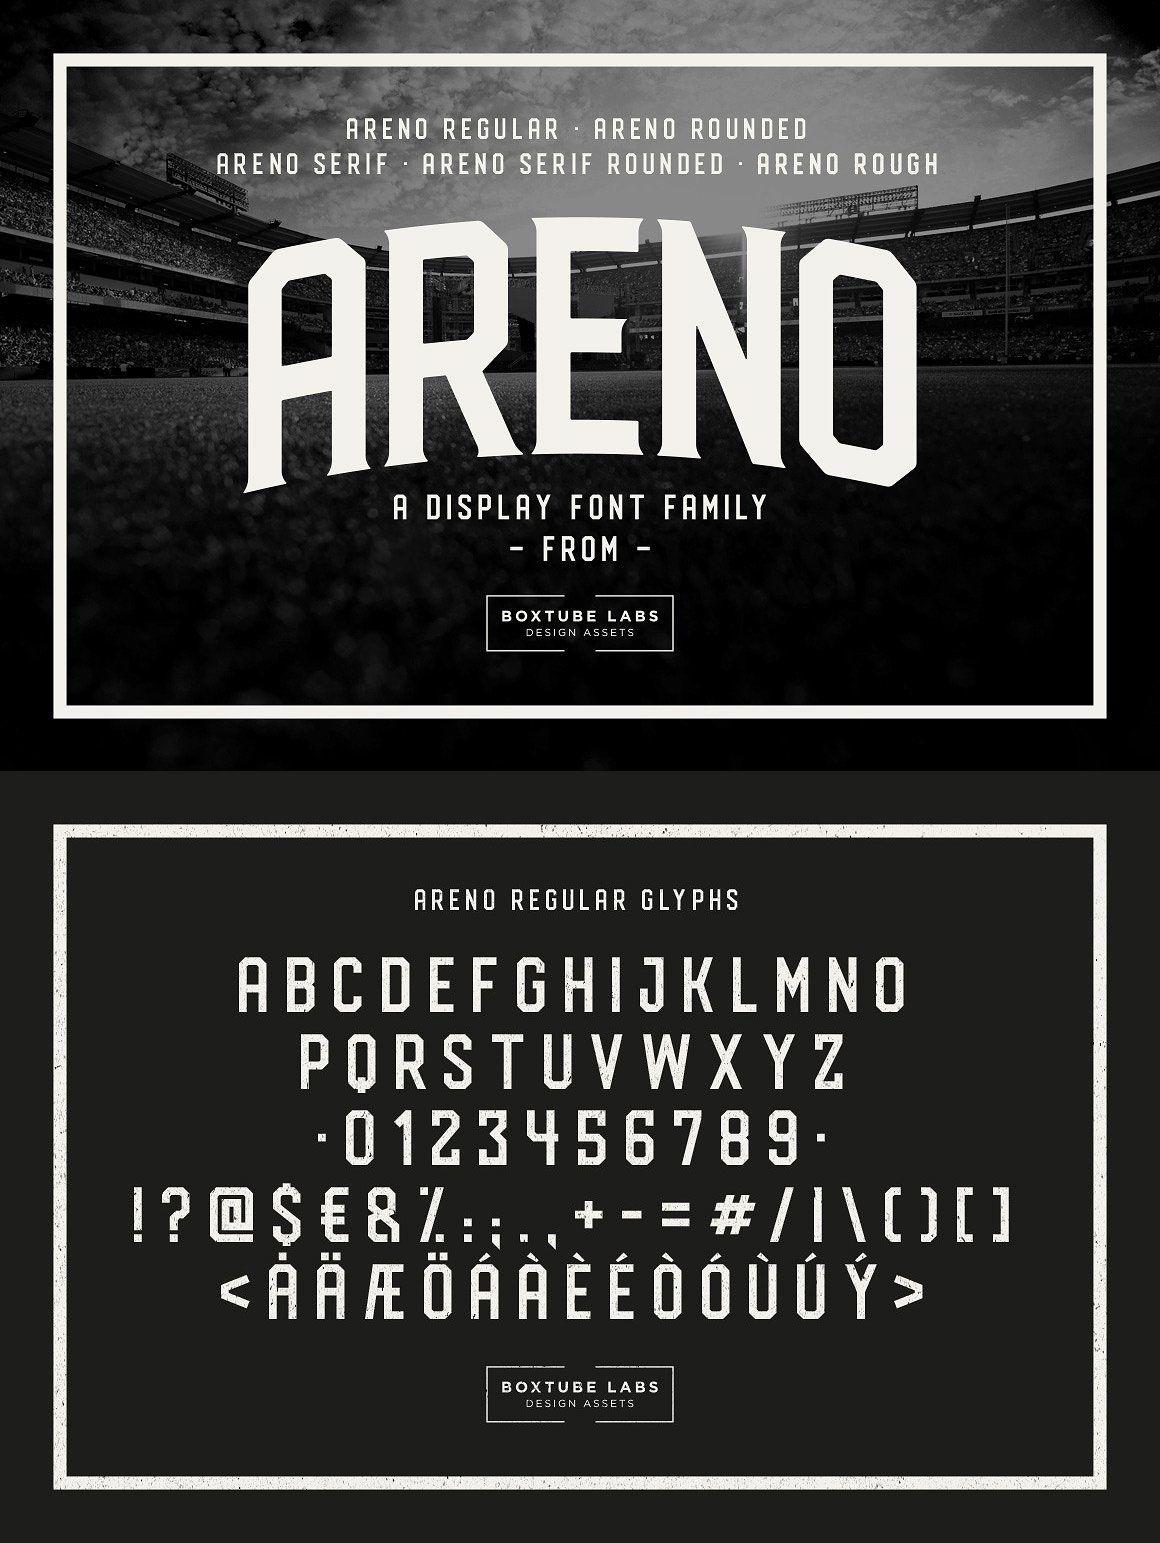 Areno Sports Fonts Vintage Fonts Brand Fonts